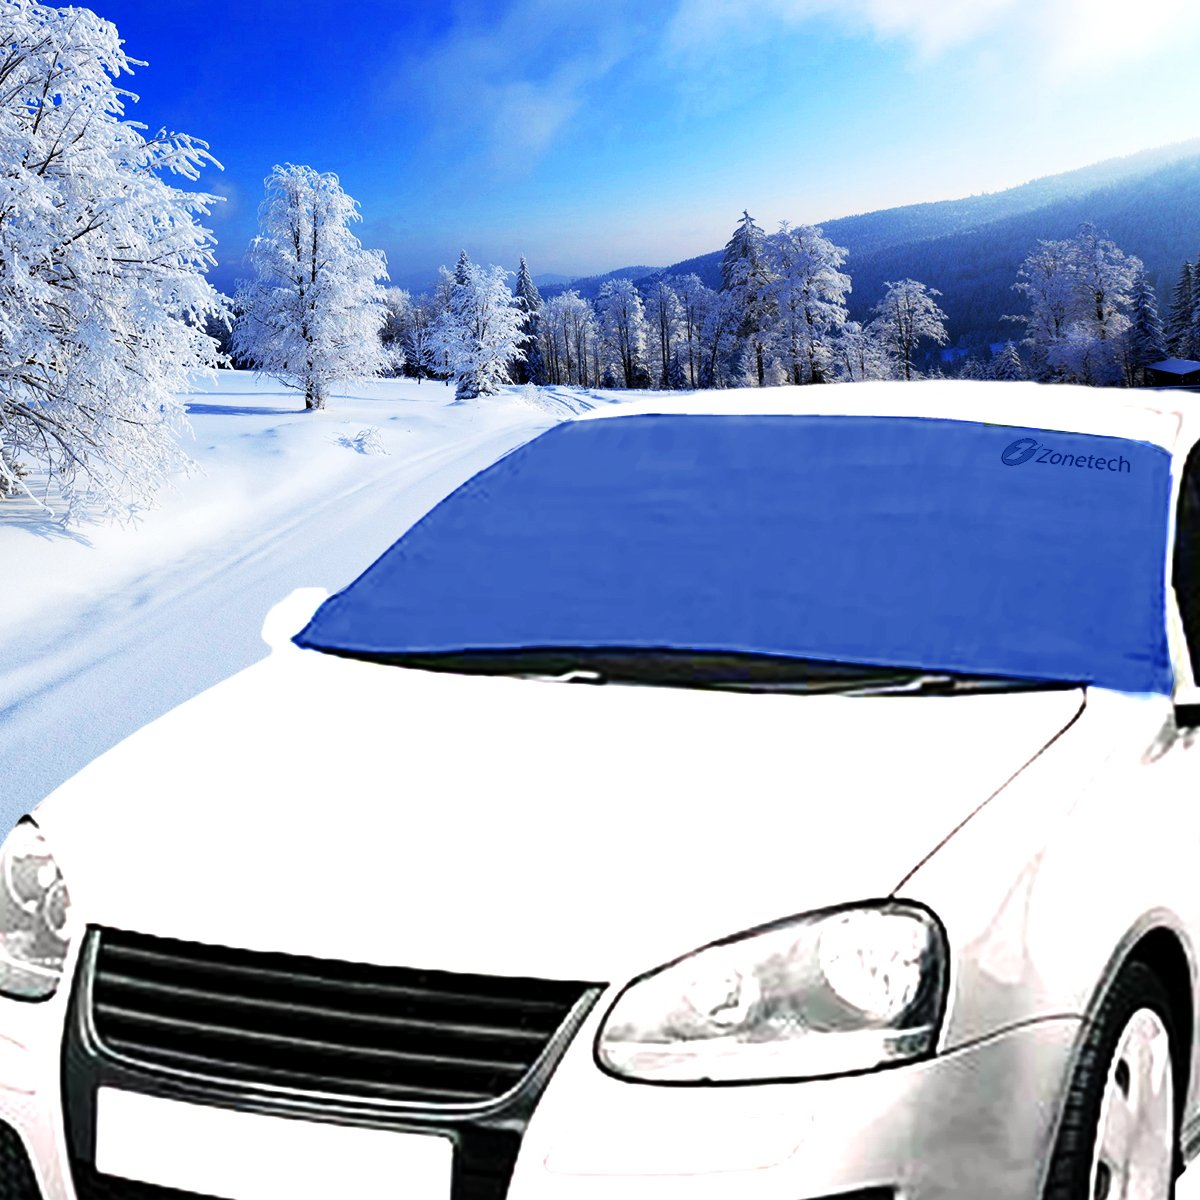 zone tech winter car windshield snow cover summer sun protector shade shield ebay. Black Bedroom Furniture Sets. Home Design Ideas